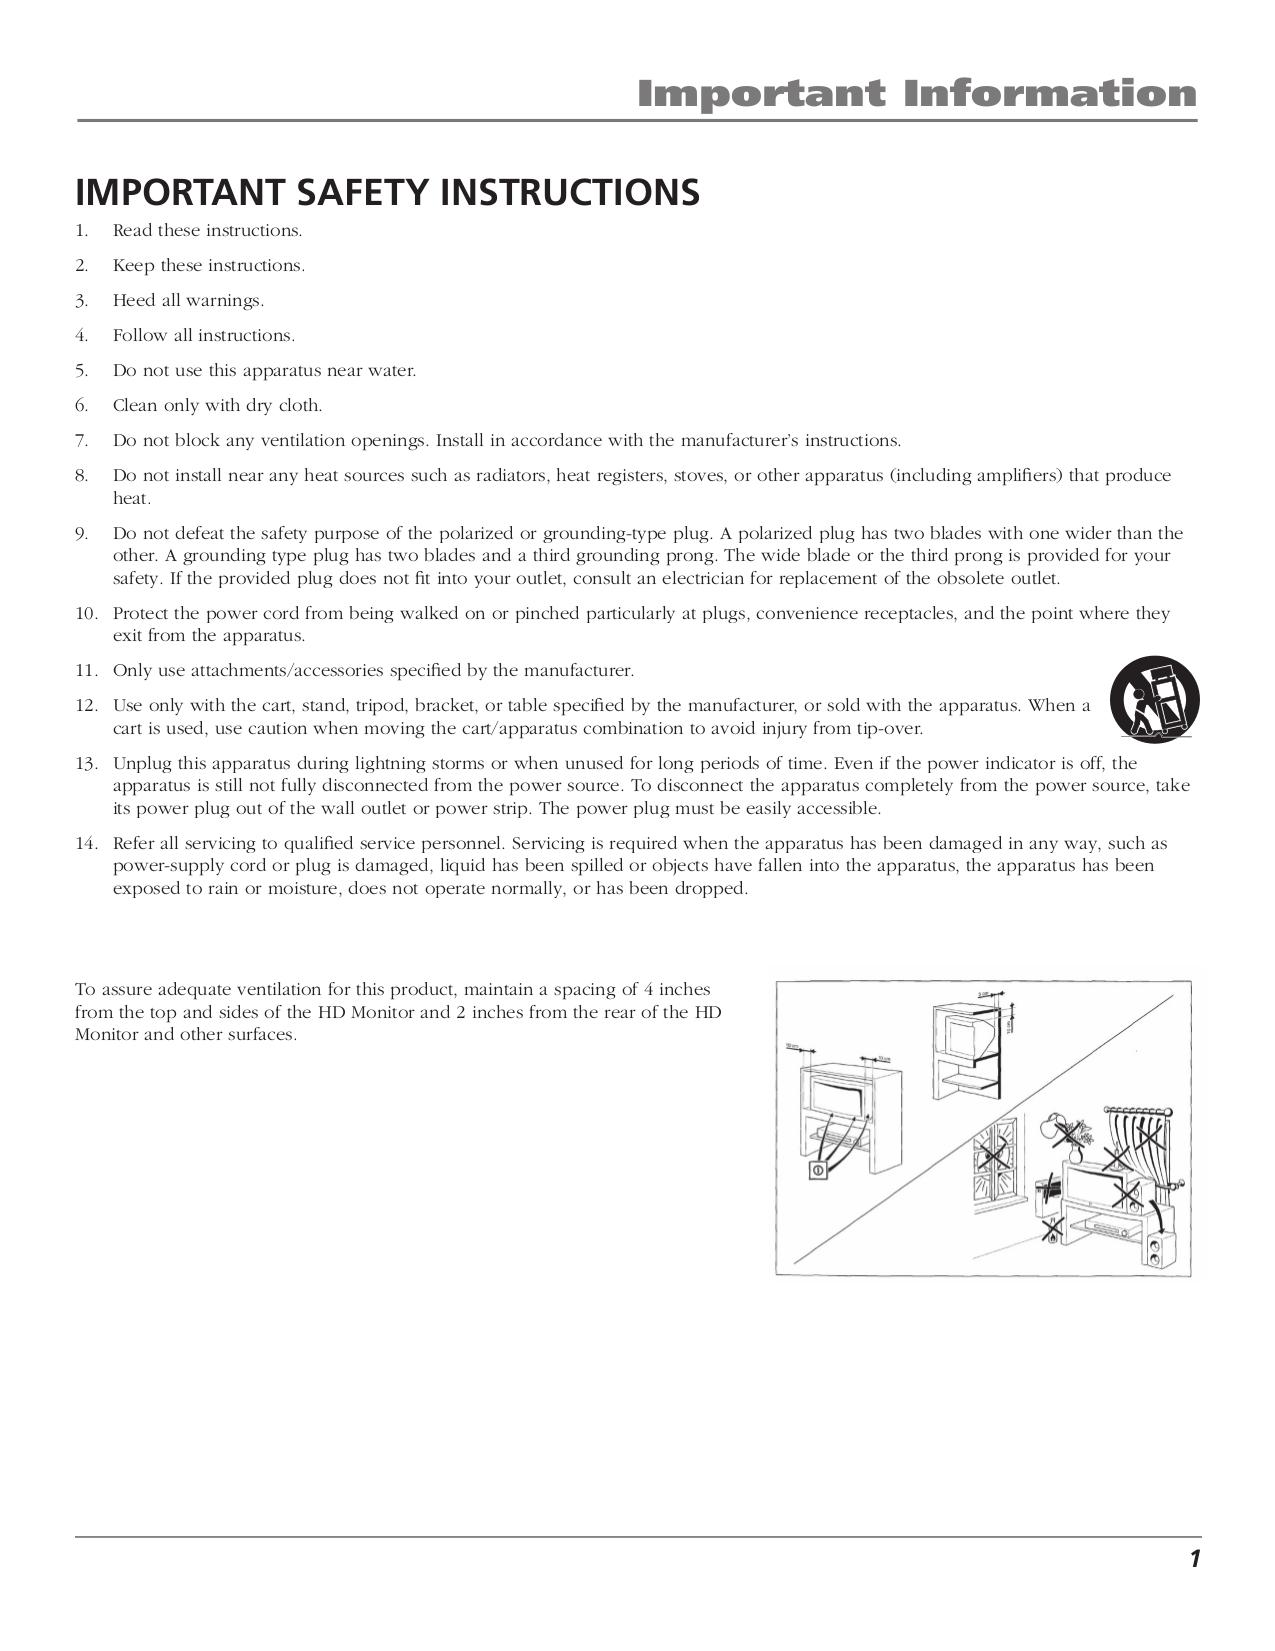 PDF manual for RCA TV D52W23